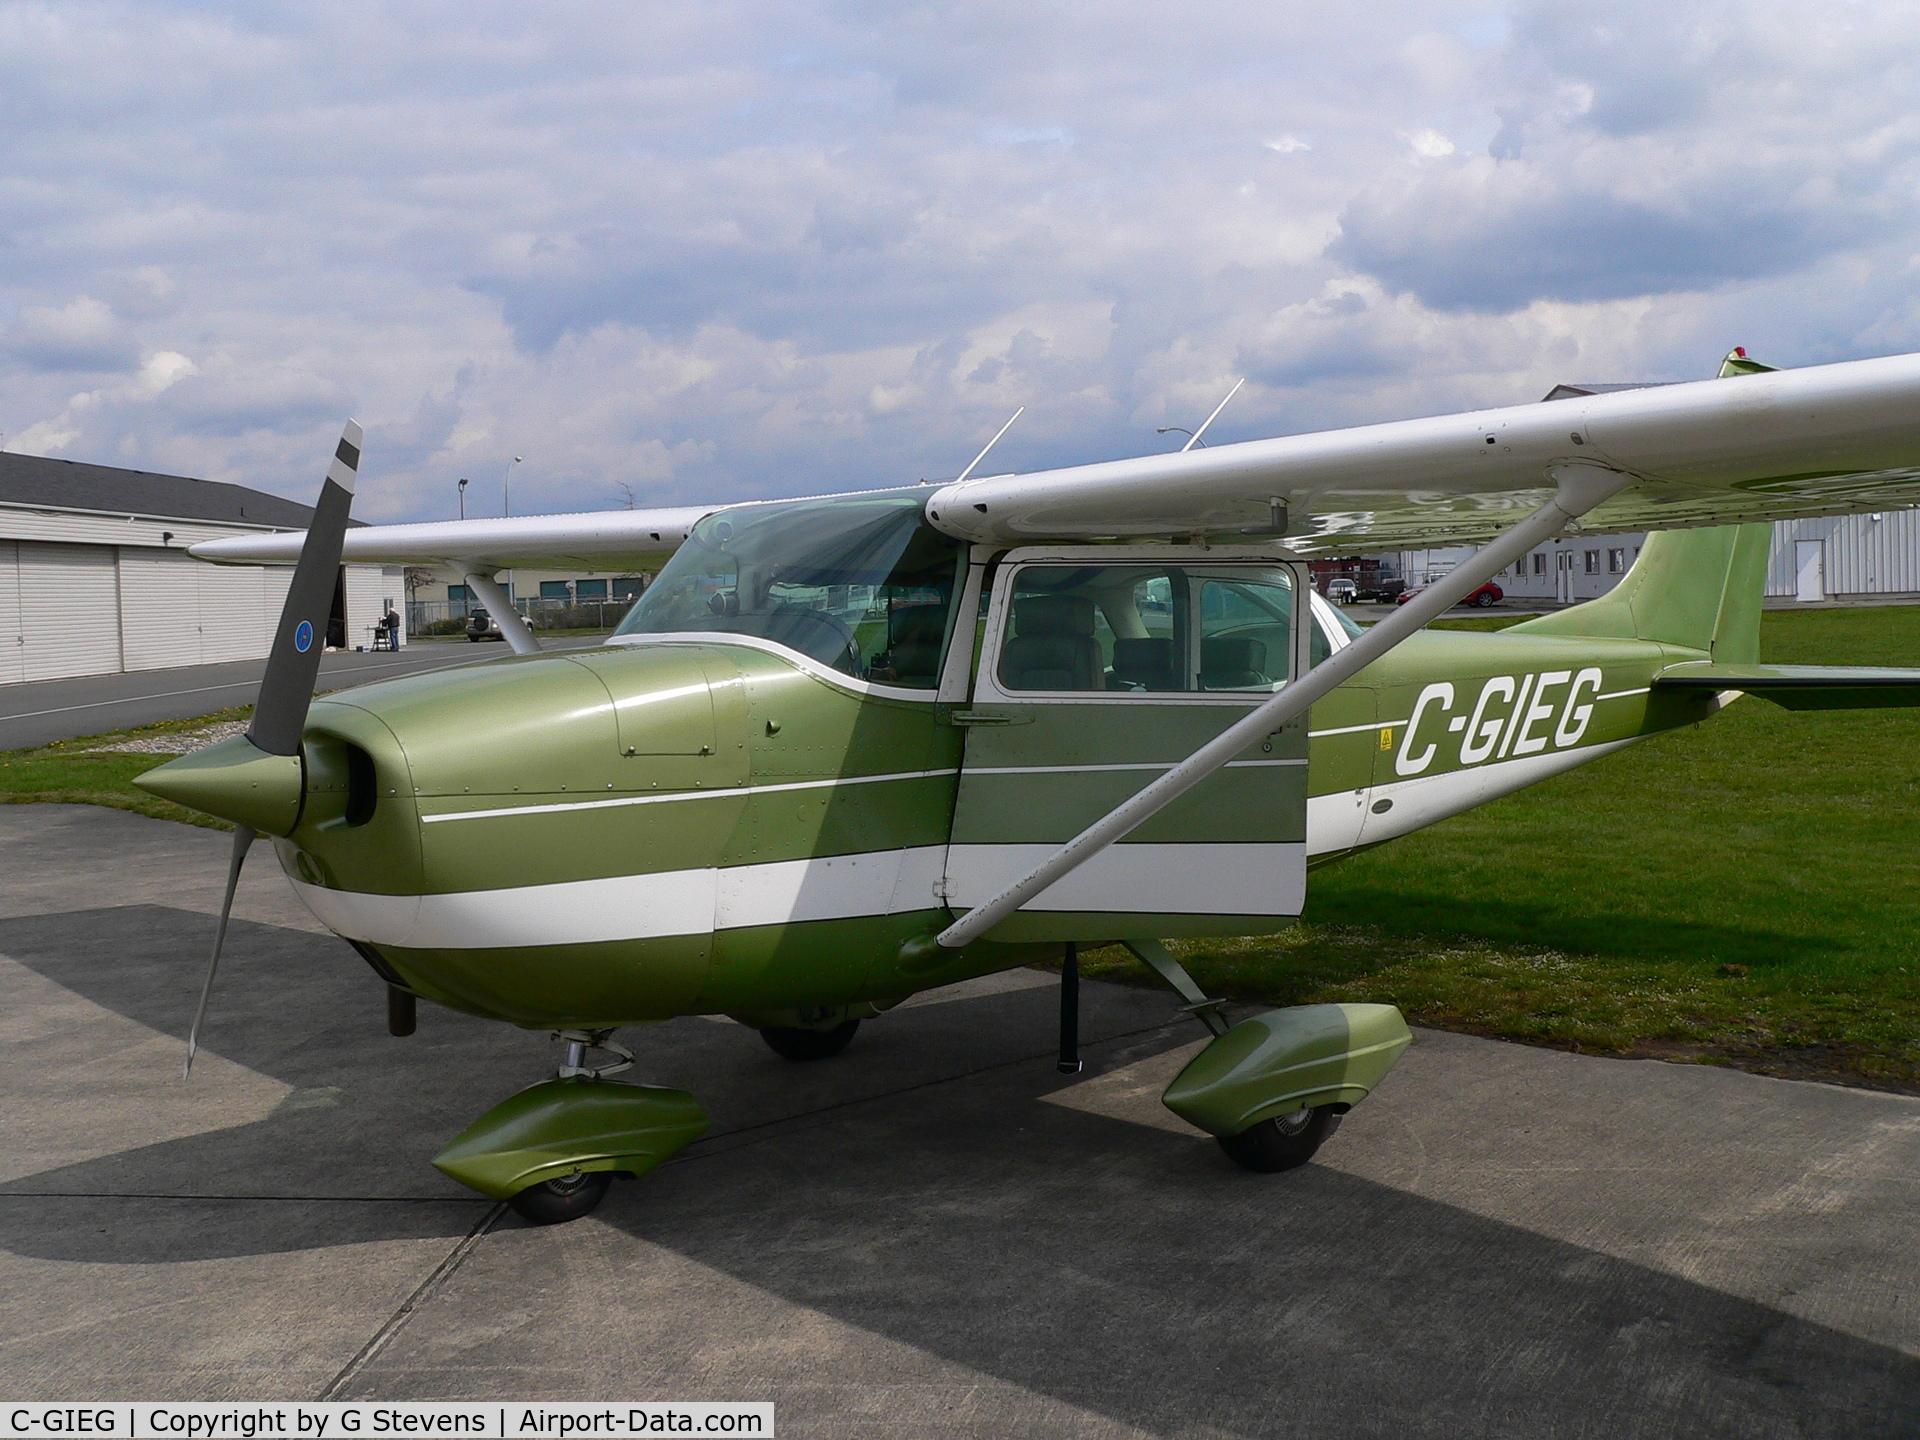 C-GIEG, 1968 Cessna 172K Skyhawk C/N 17257194, Splendid in her original paint!